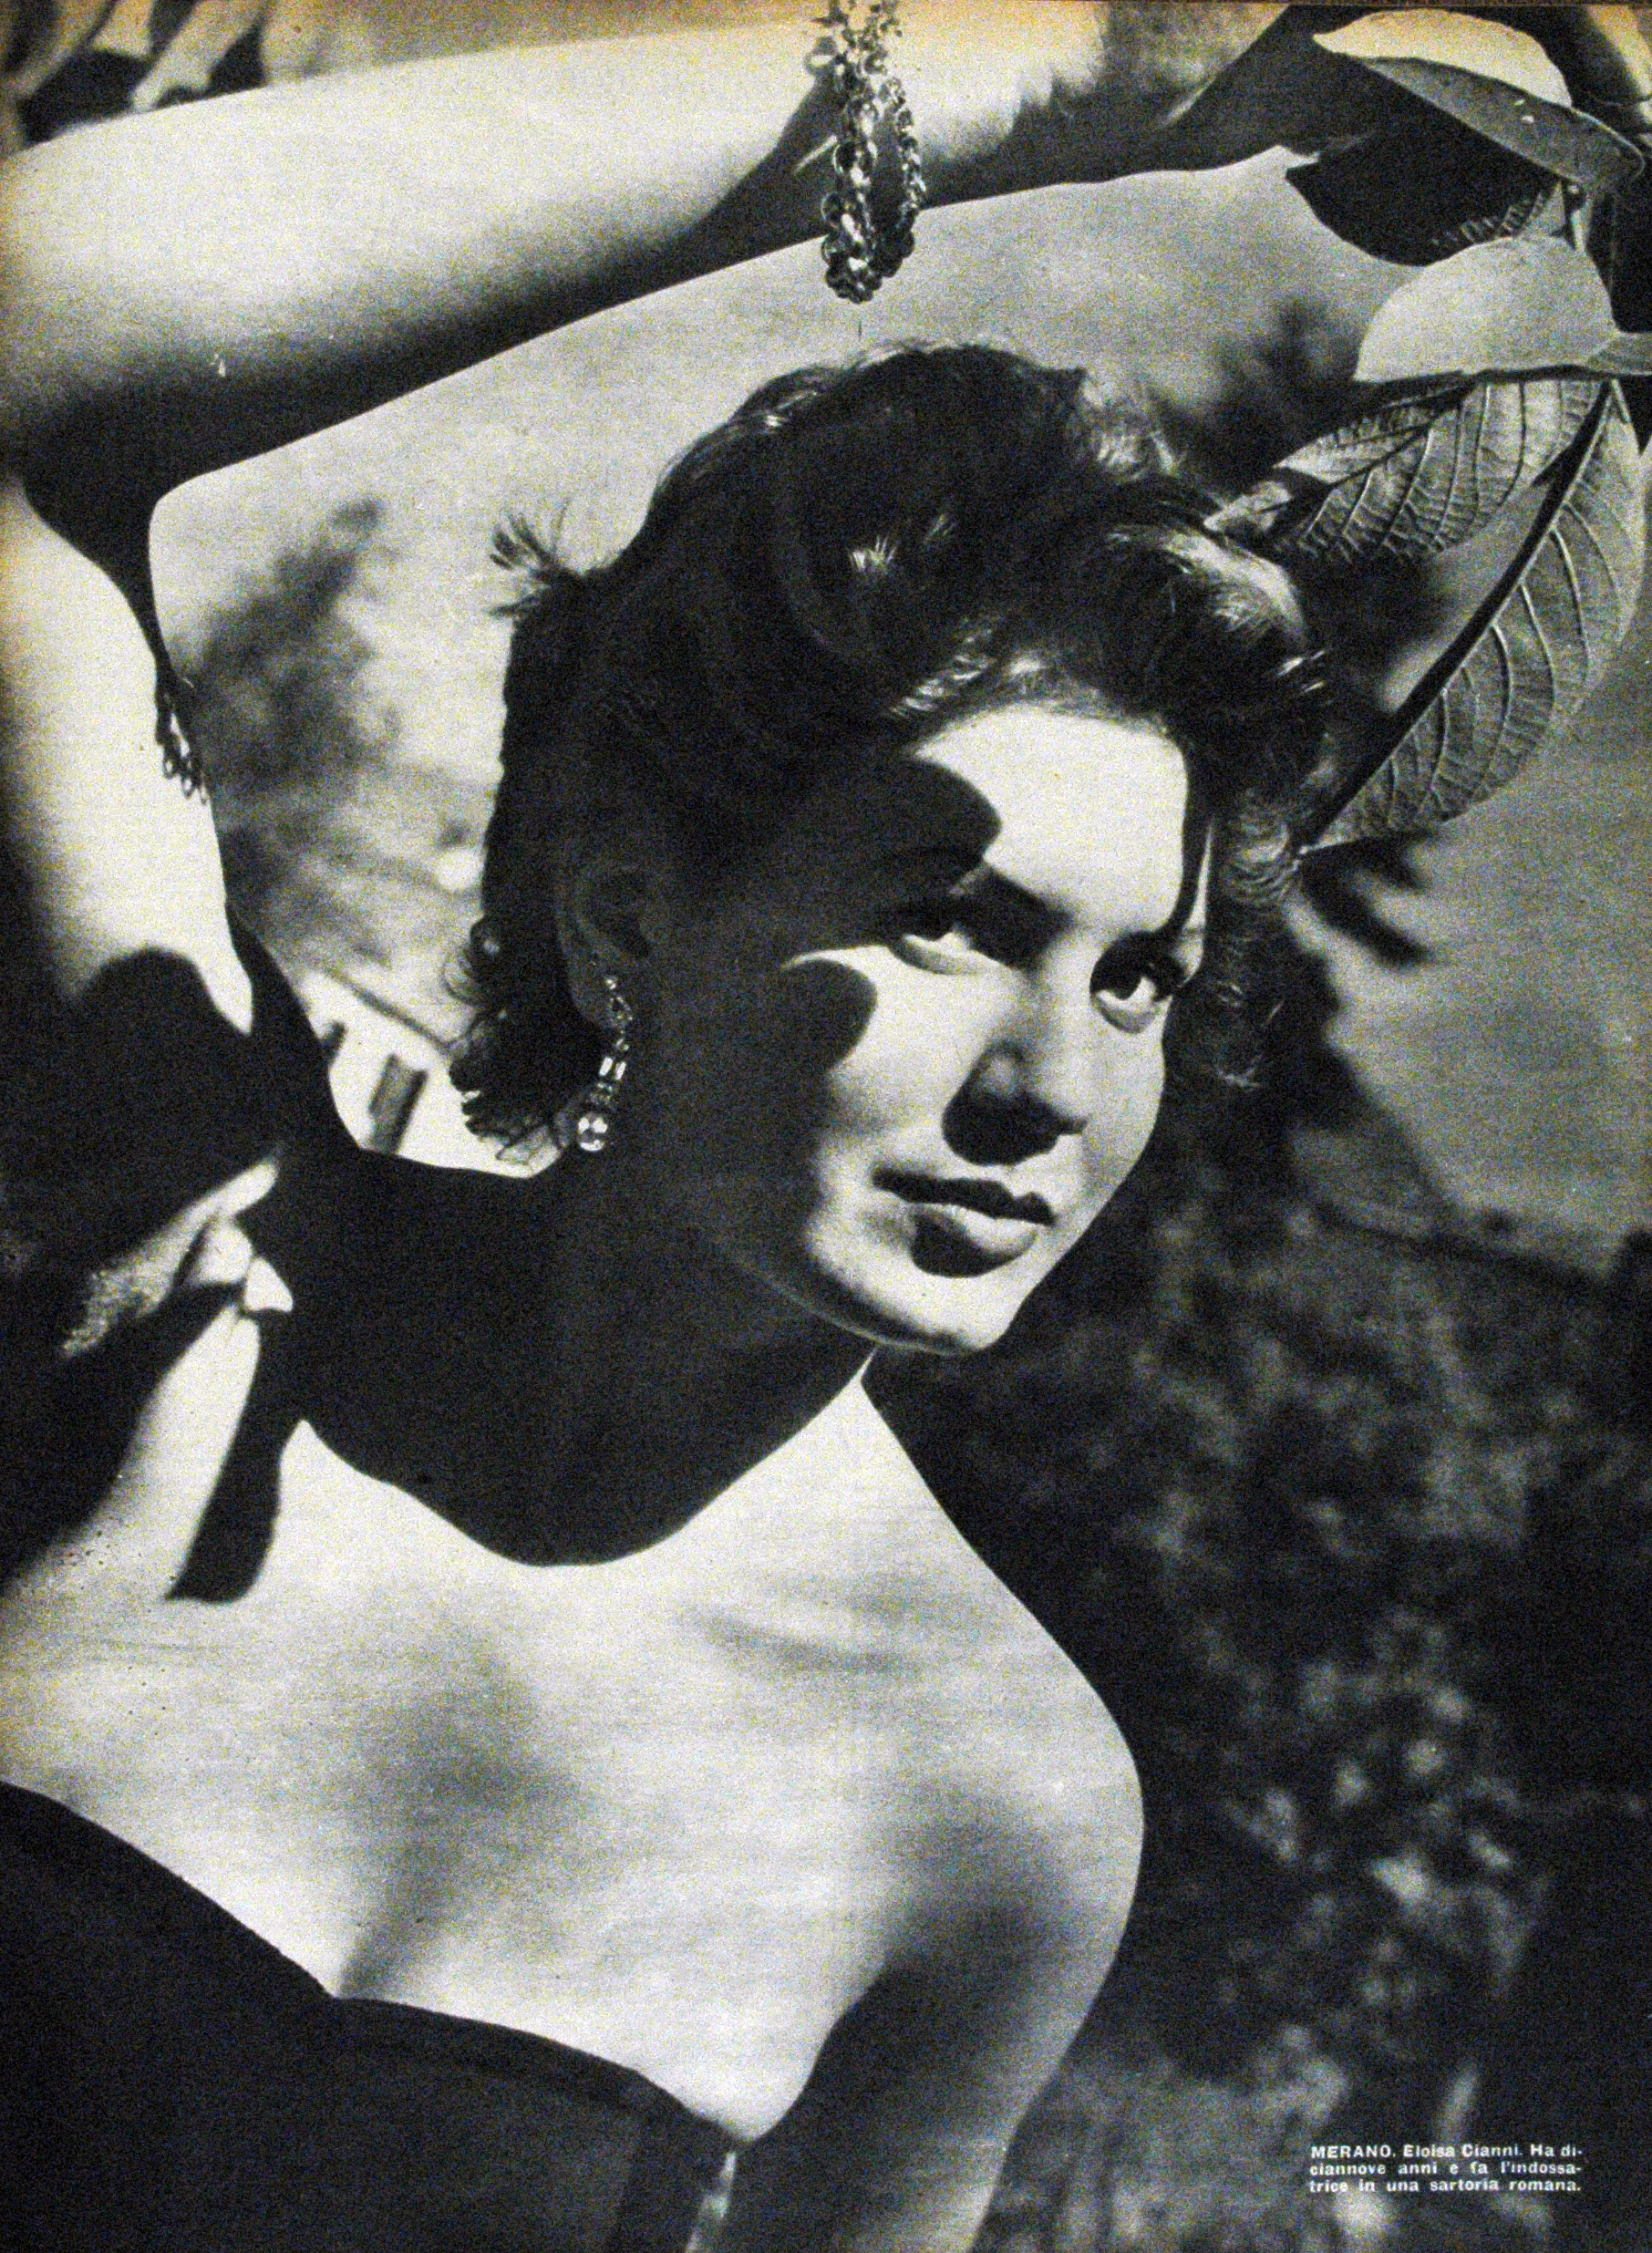 Eloisa Cianni